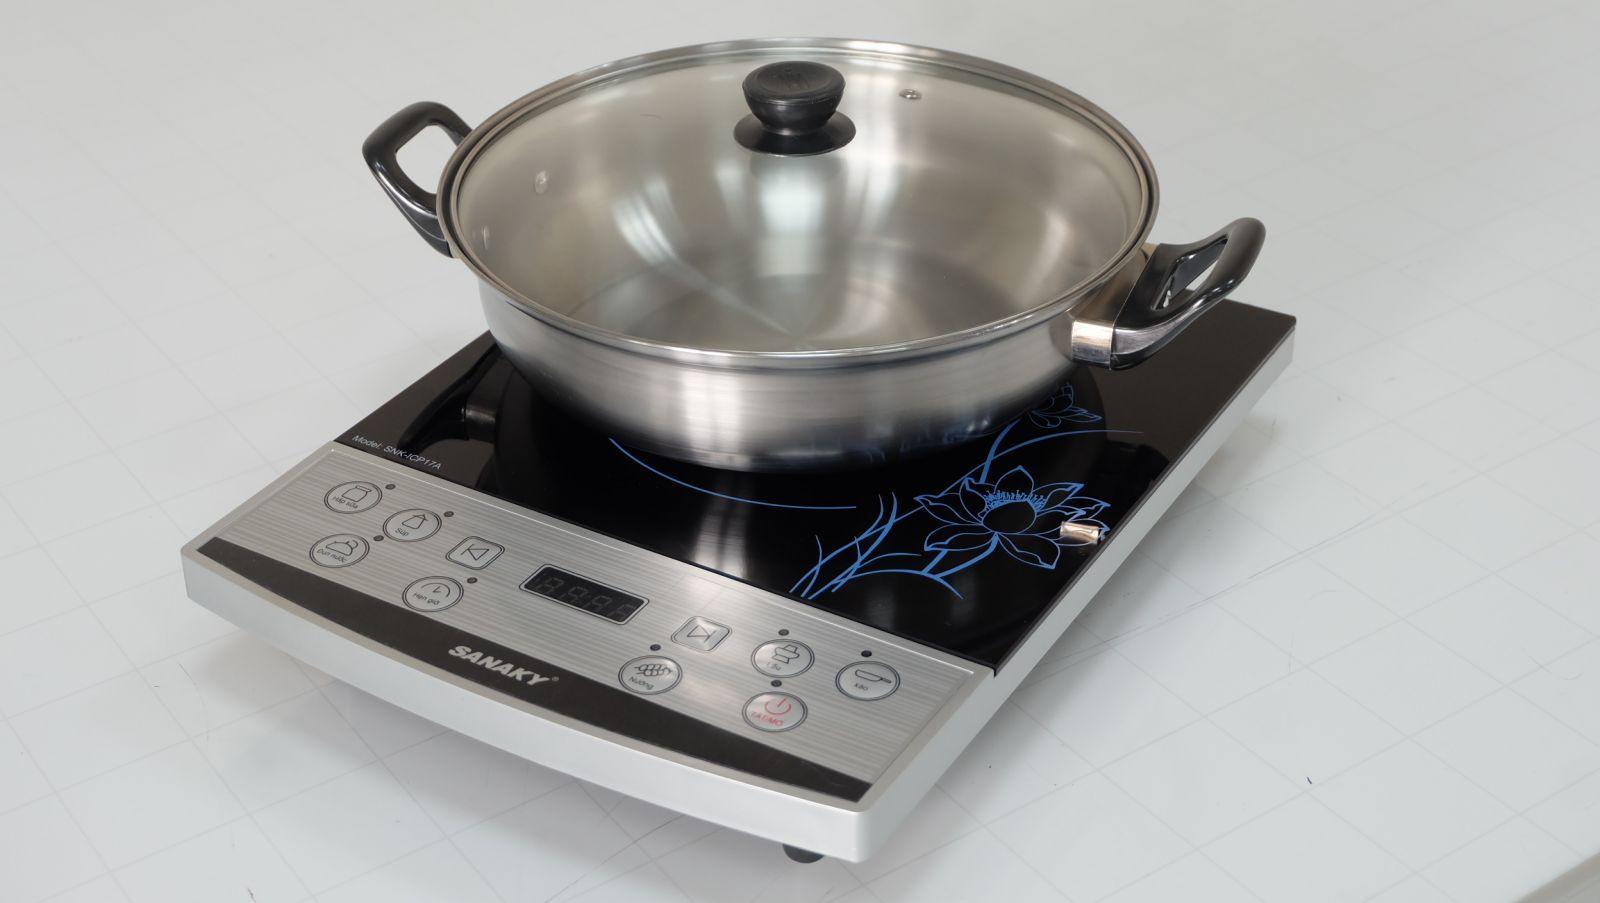 Bếp từ Sanaky ICP 17A